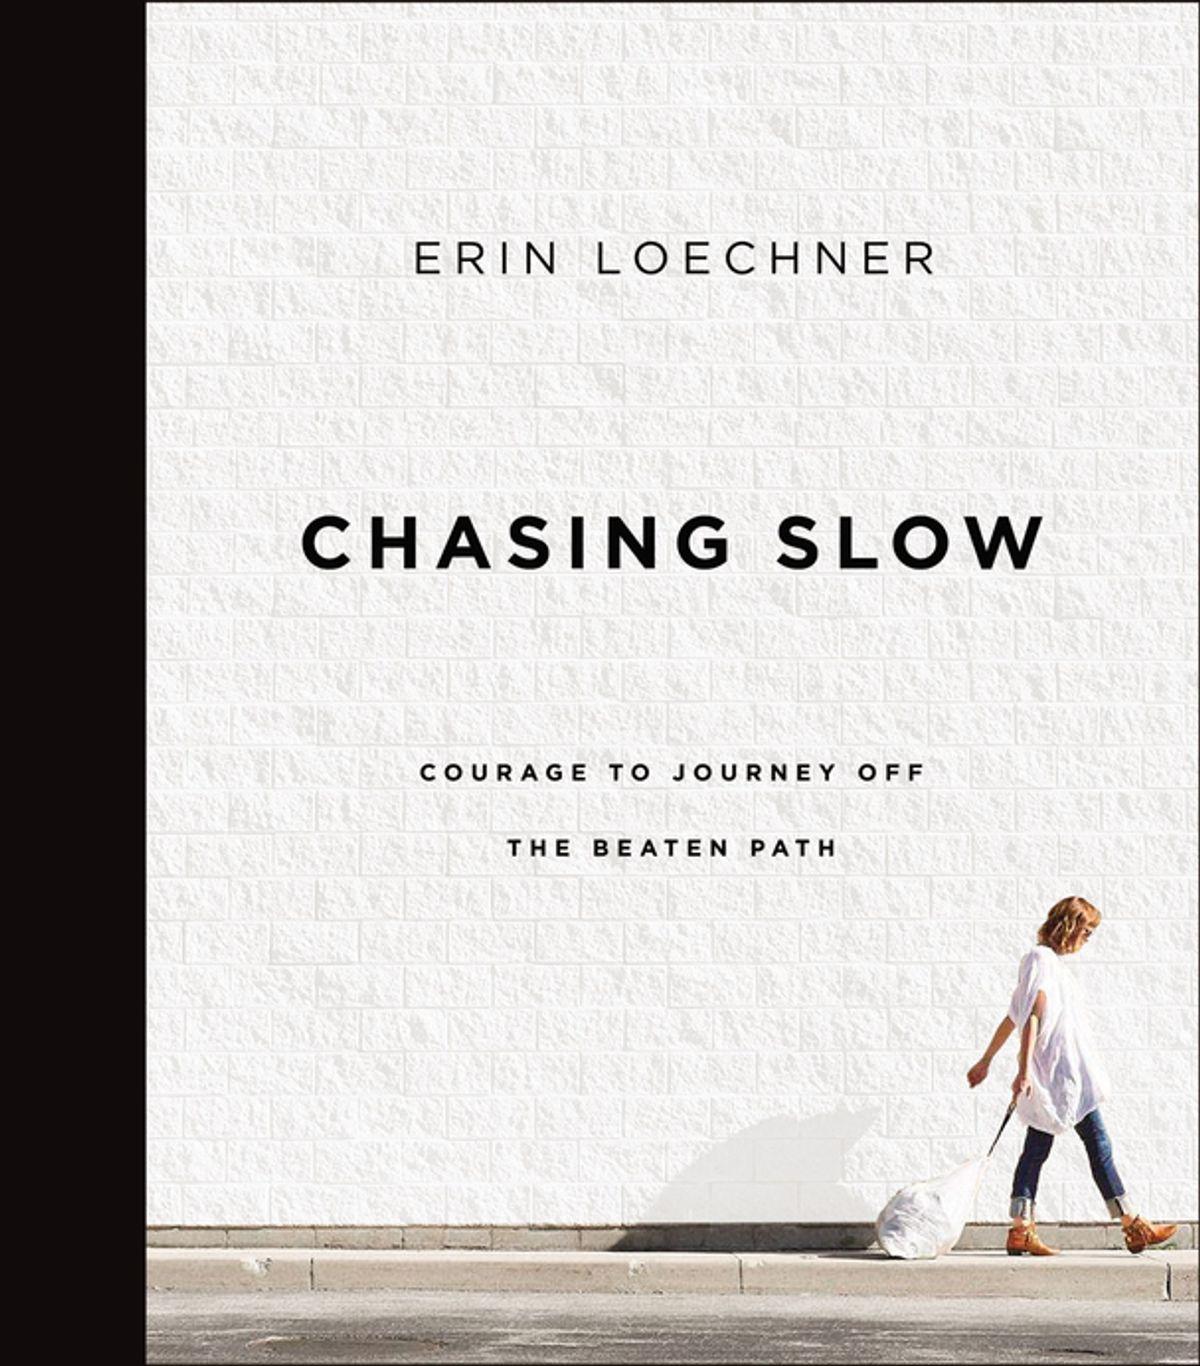 chasing-slow.jpg